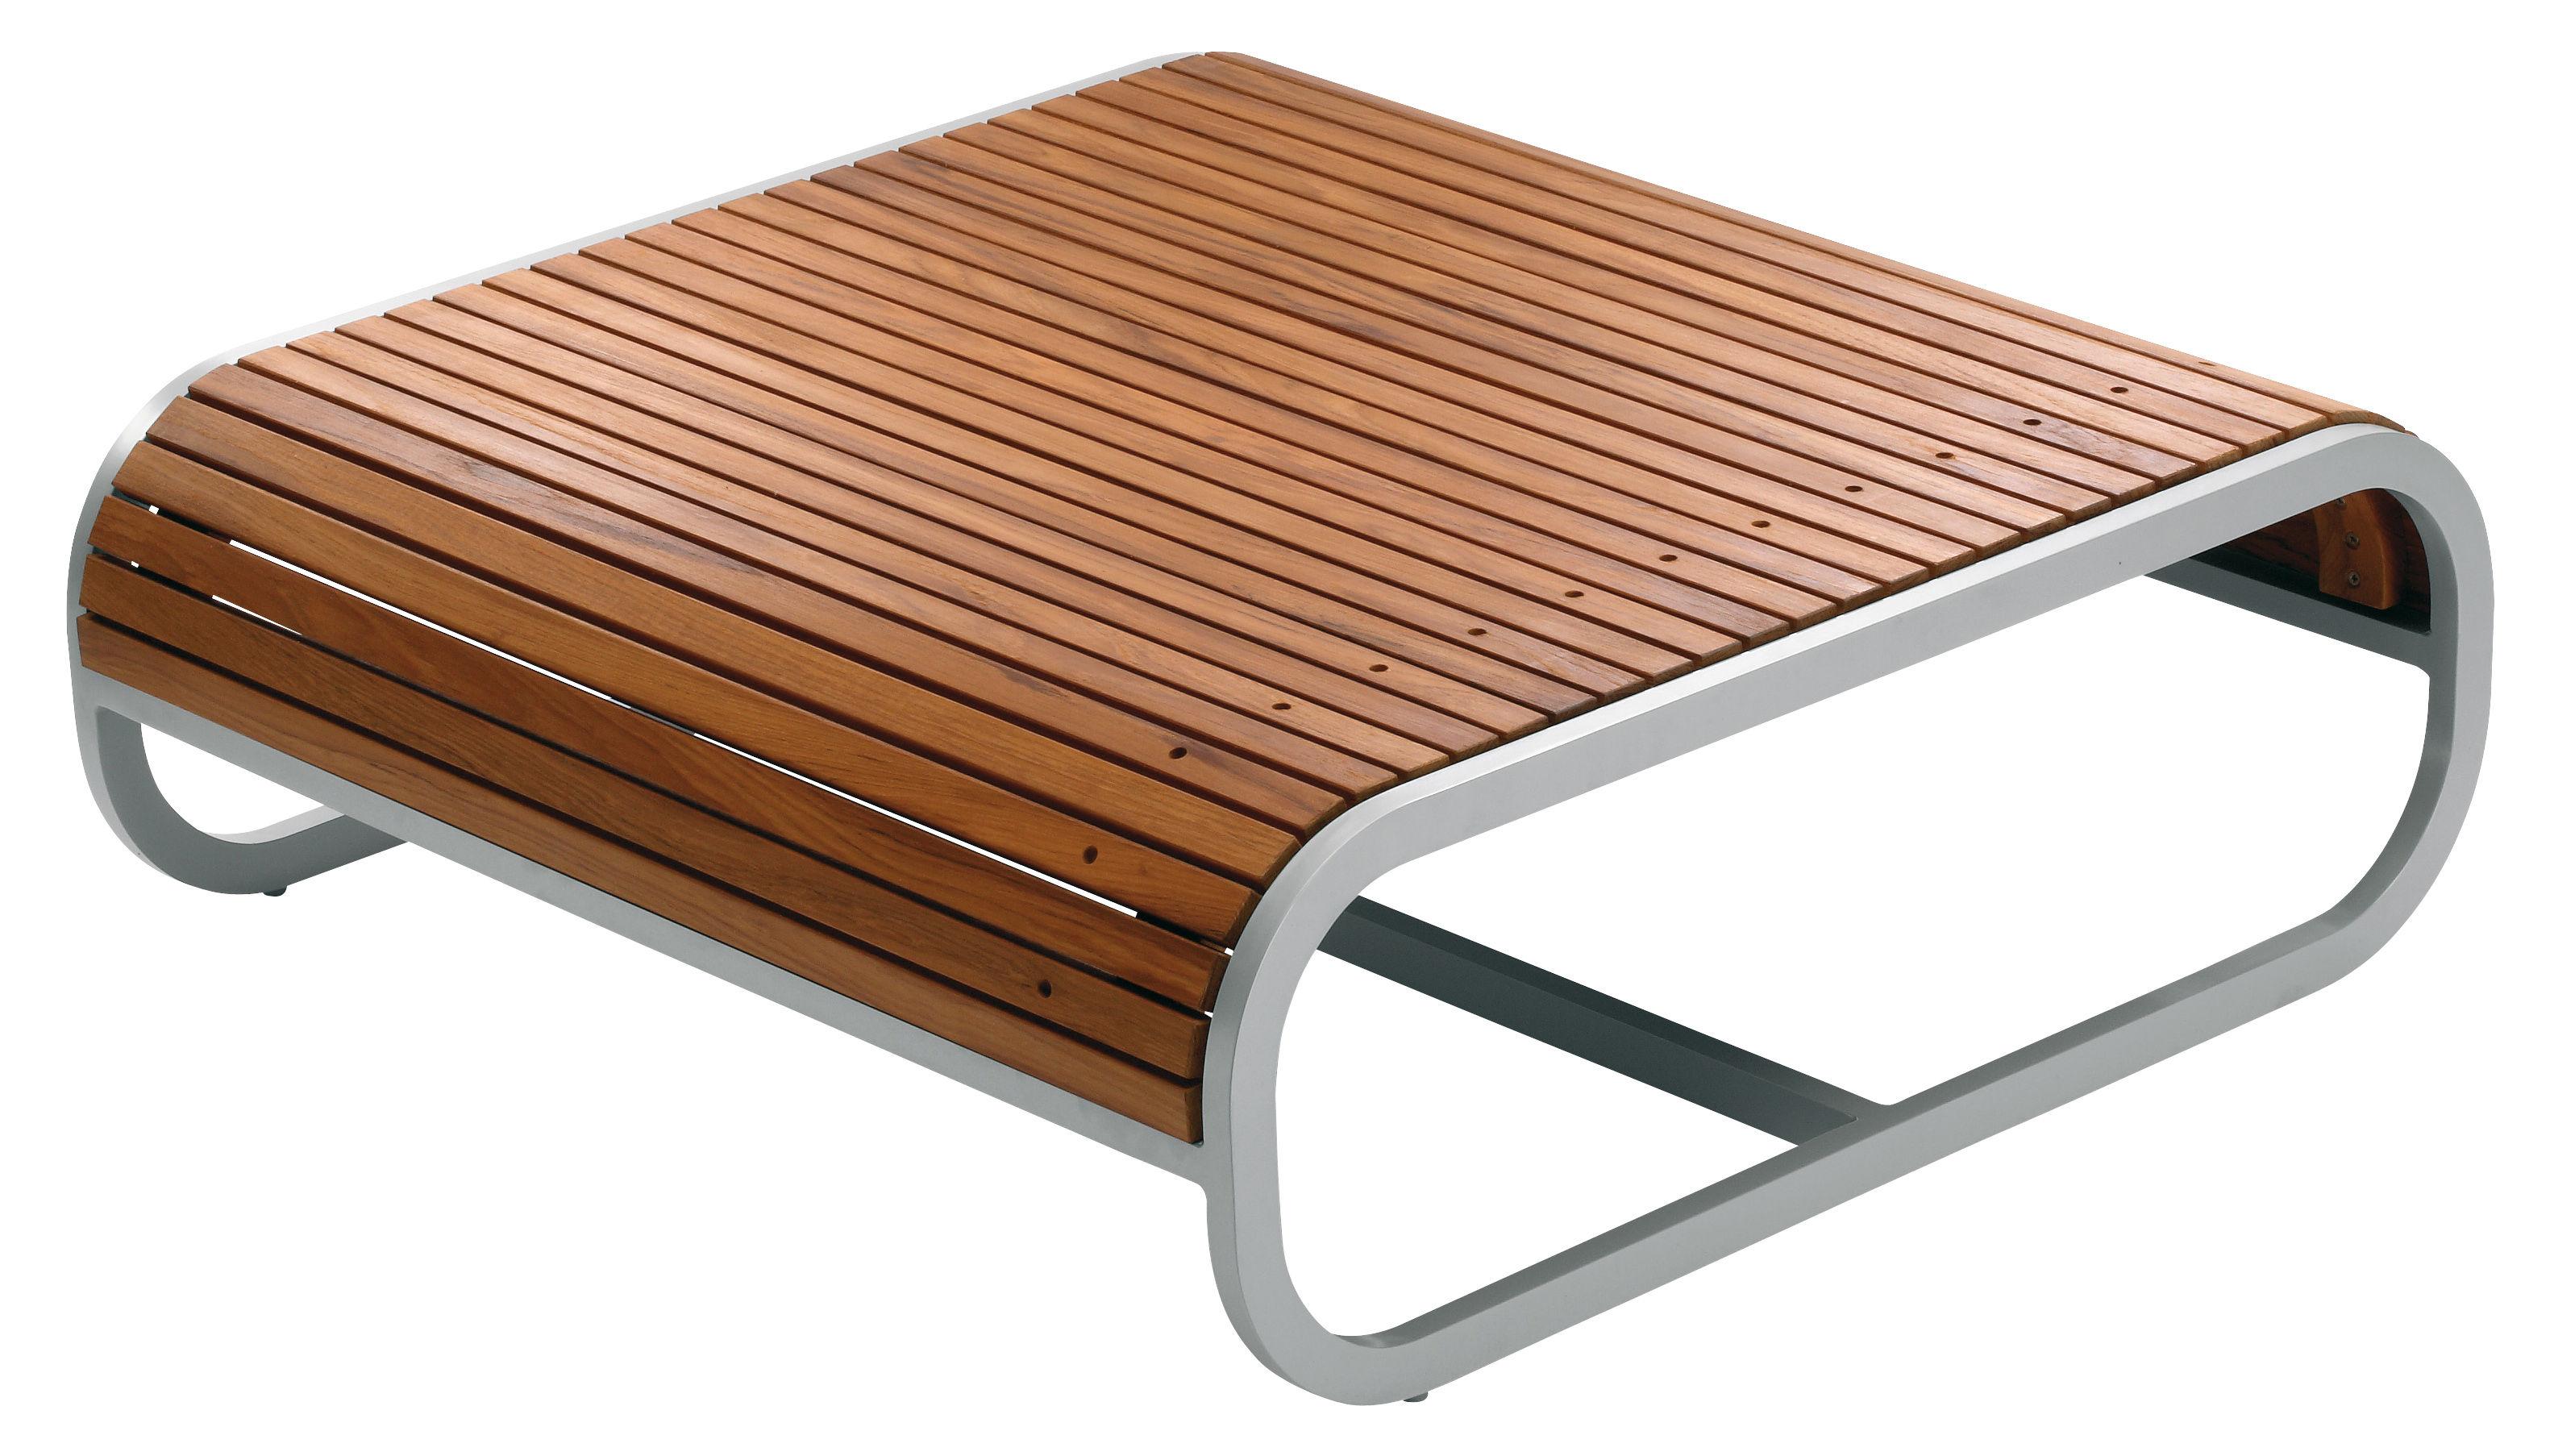 Mobilier - Tables basses - Table basse Tandem version teck - EGO Paris - Teck - Aluminium laqué, Teck